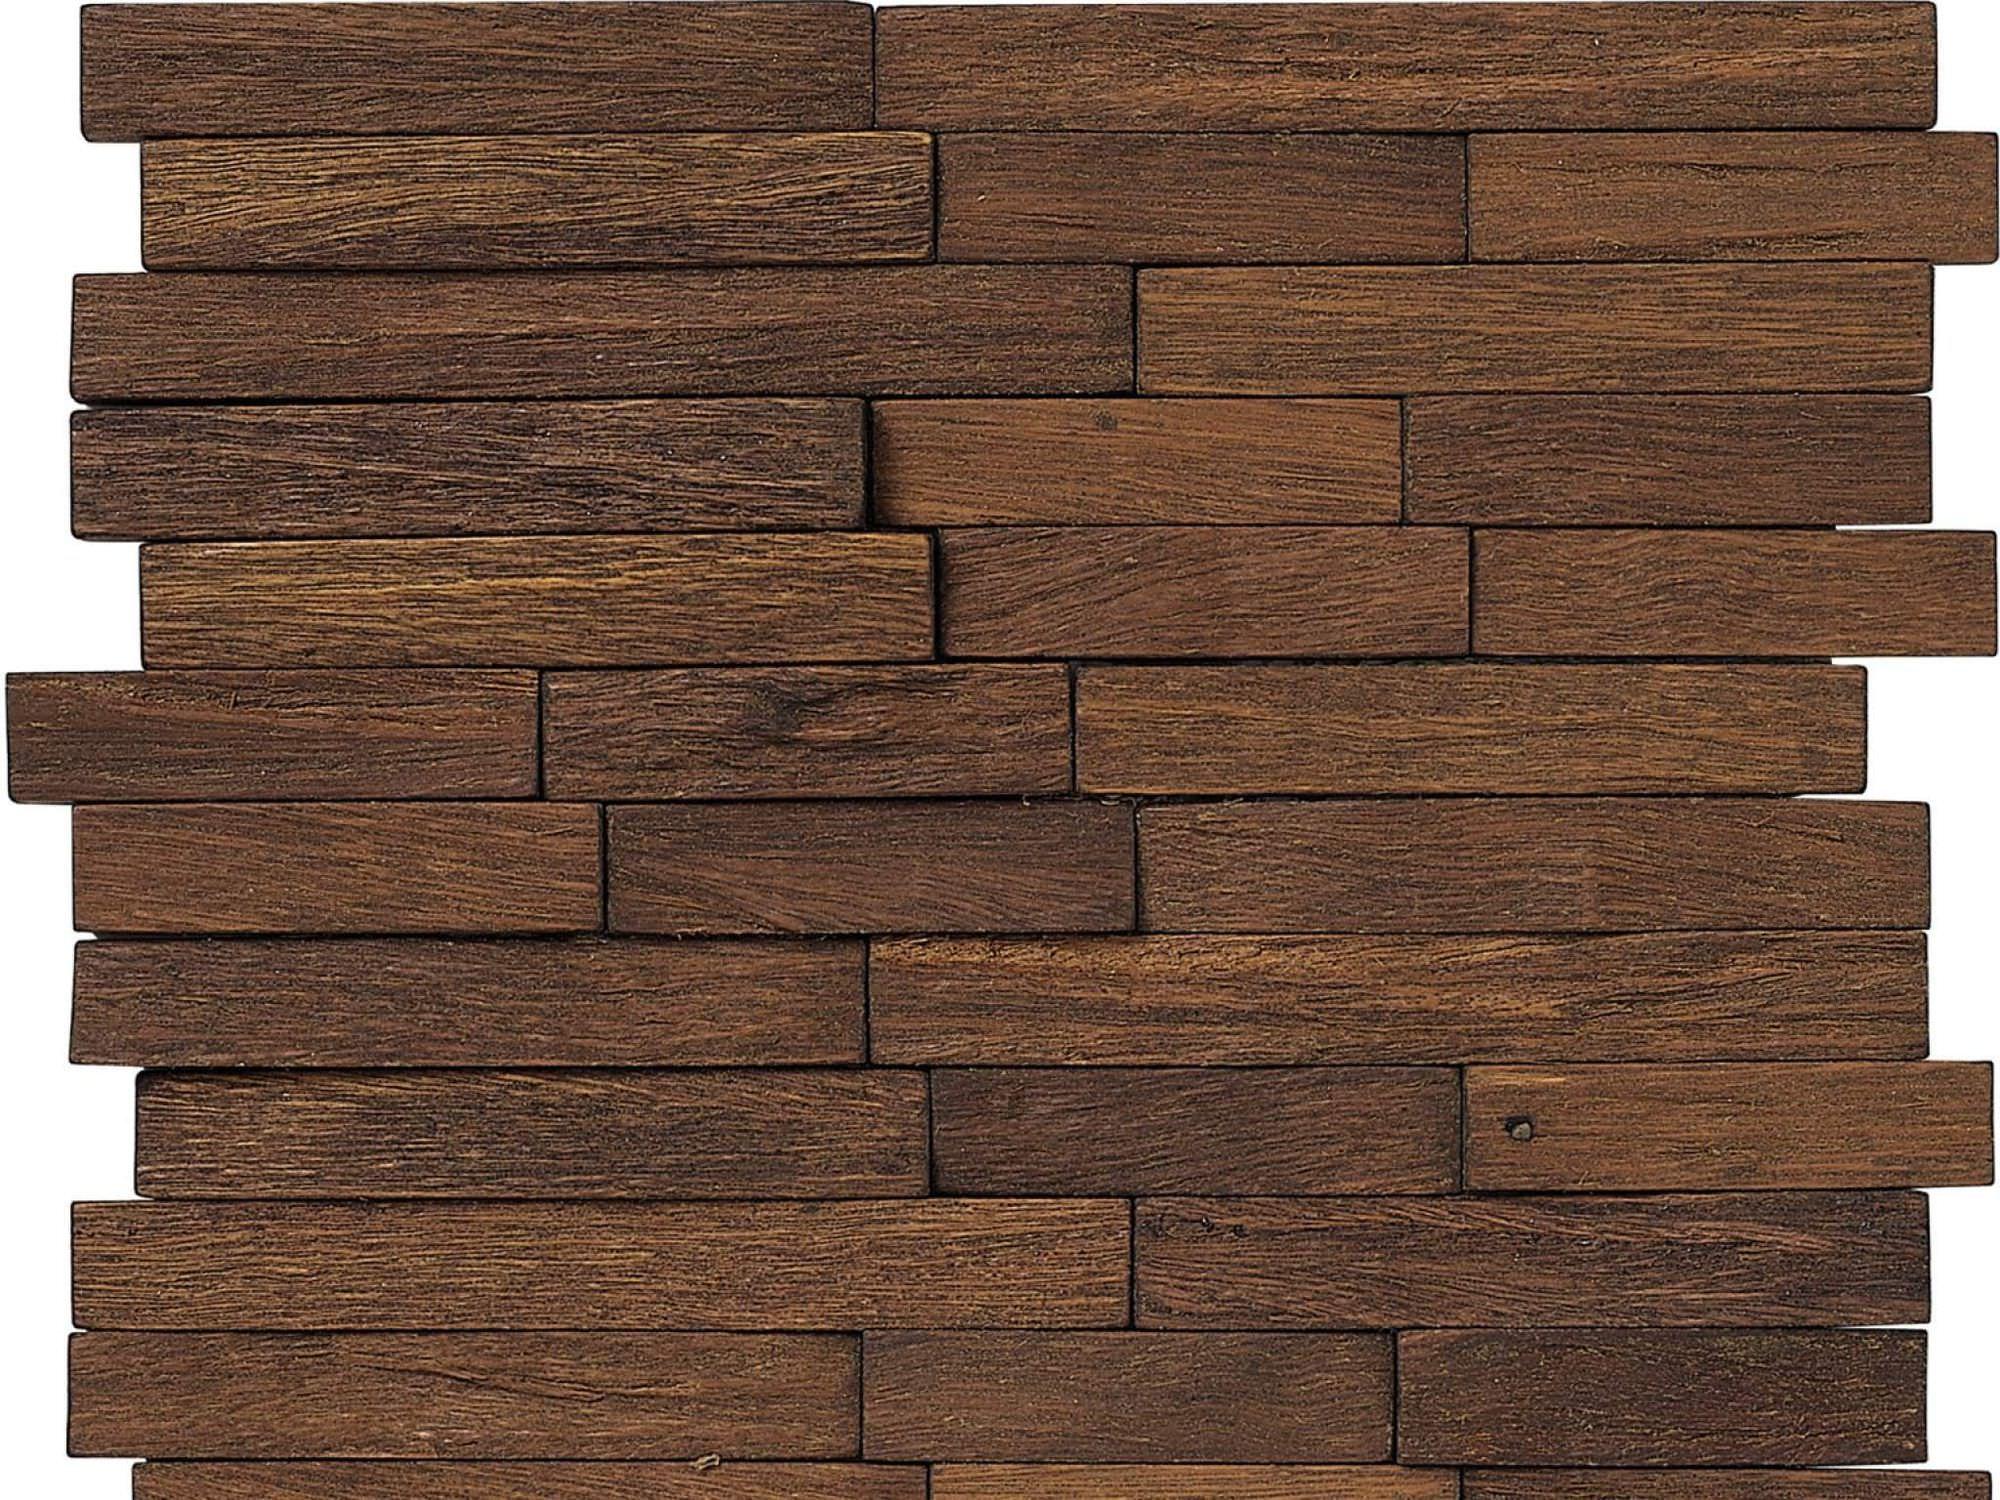 Exceptionnel Decorative Walls · Pamesa Ceramica 2015   Google Search · Wood Panel ...